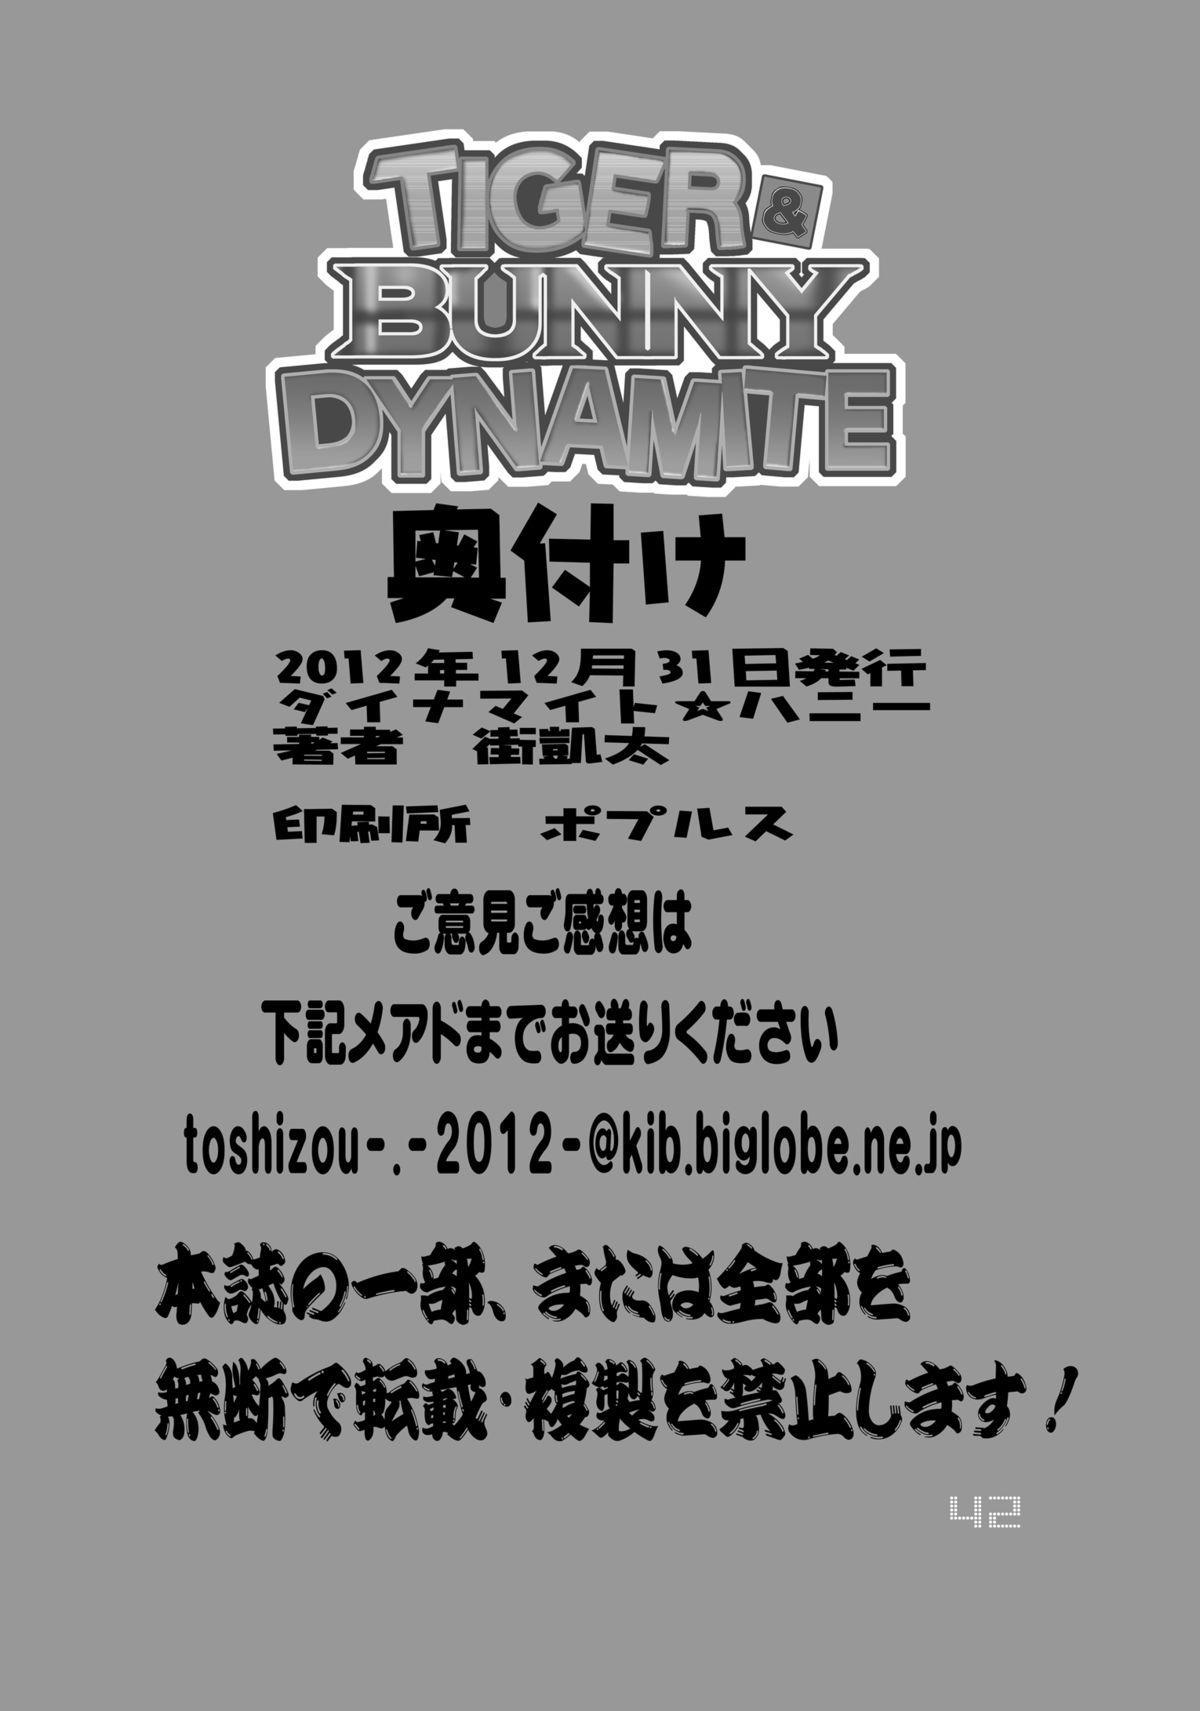 Tiger & Bunny Dynamite 41